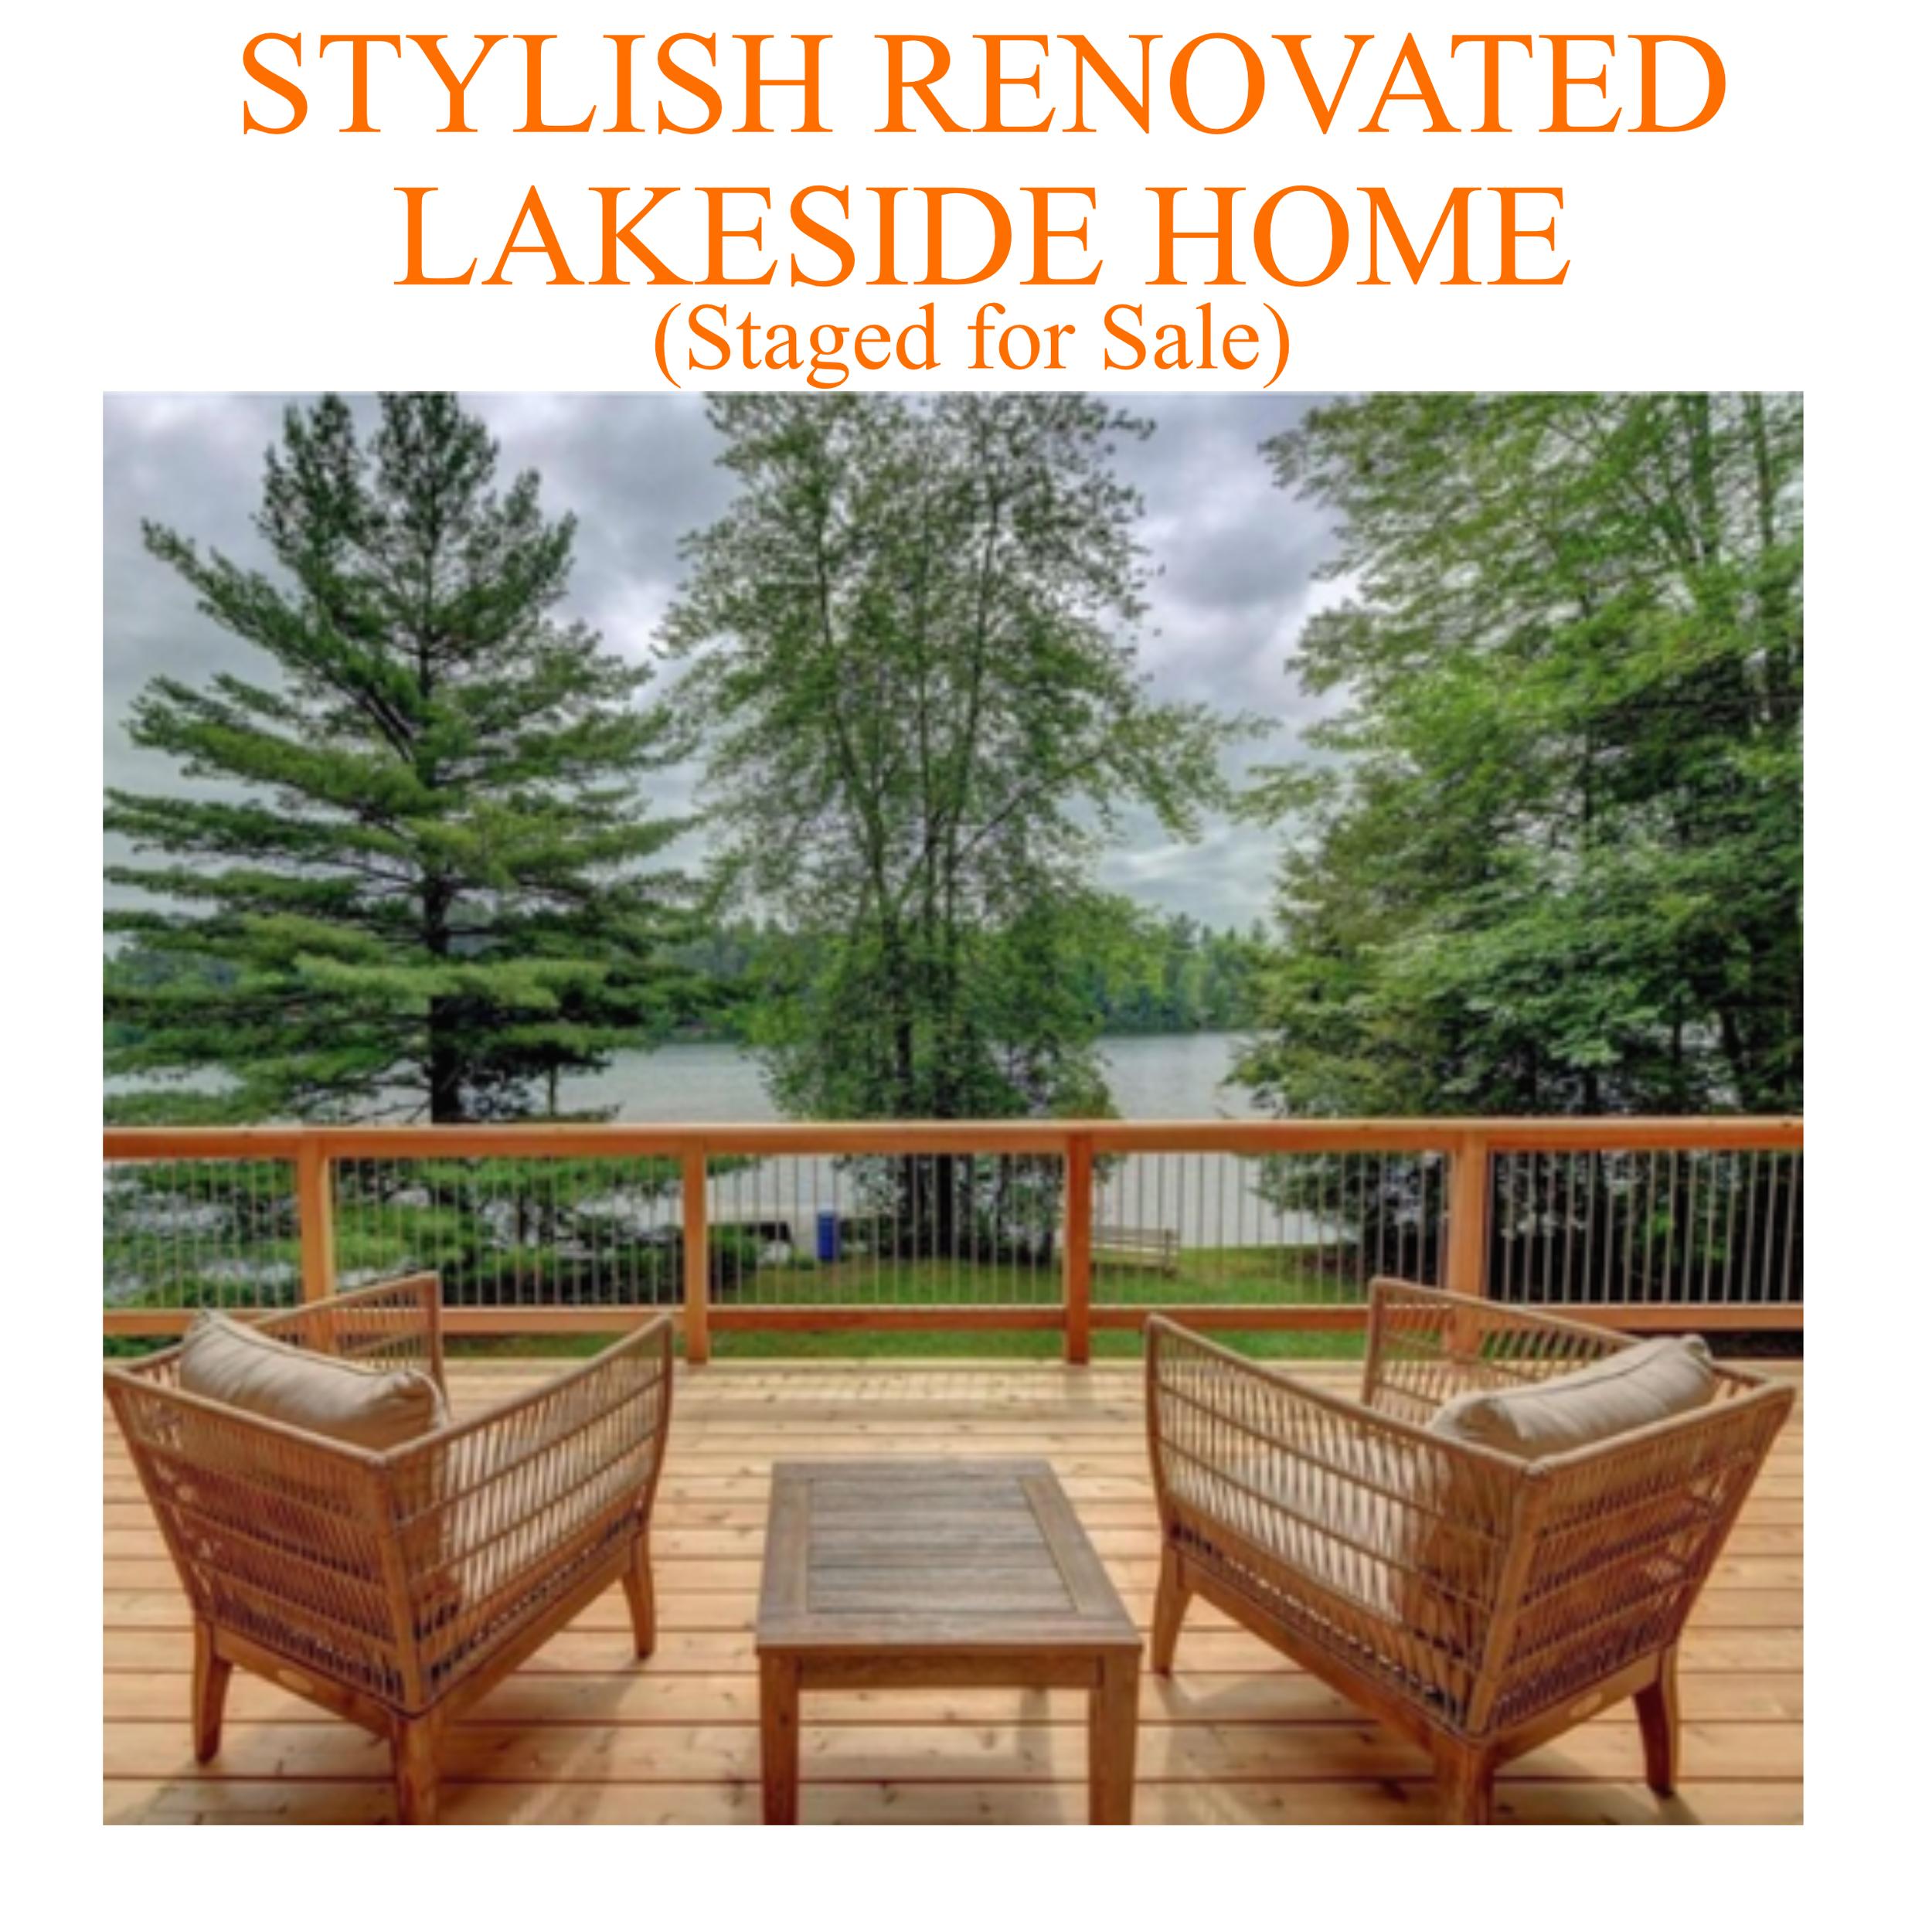 Stylish Renovated Lakeside Home.png